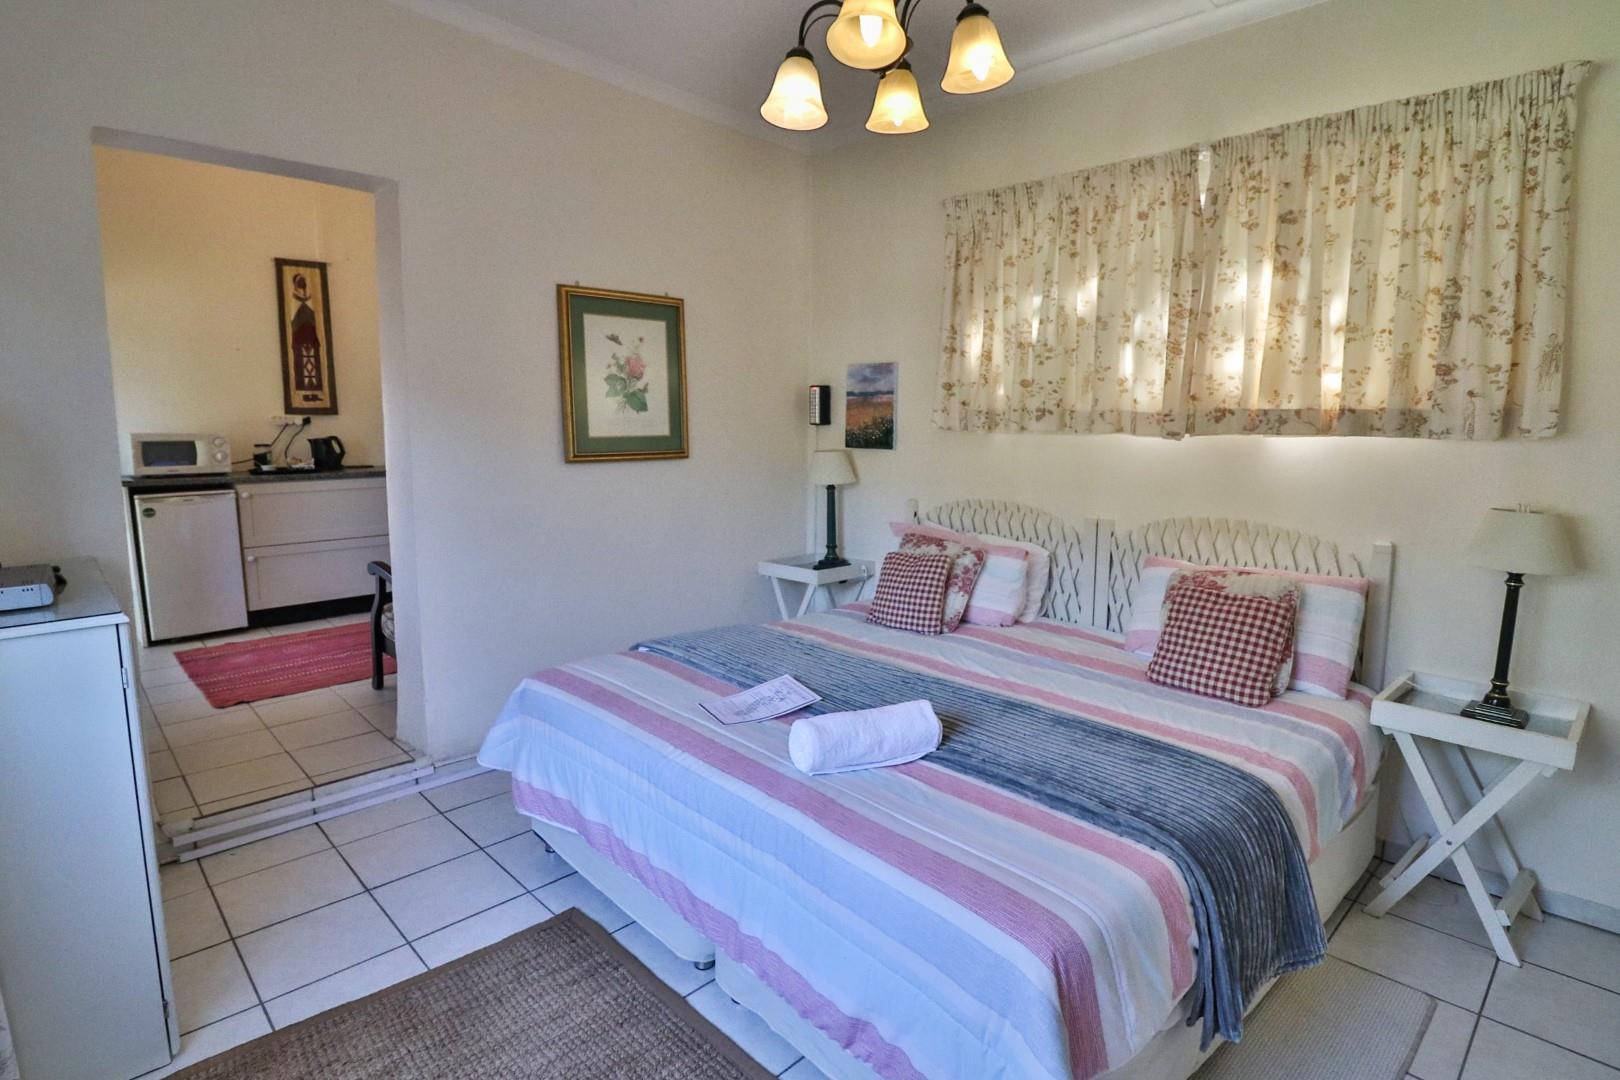 6 Bedroom House For Sale in Pietermaritzburg Central